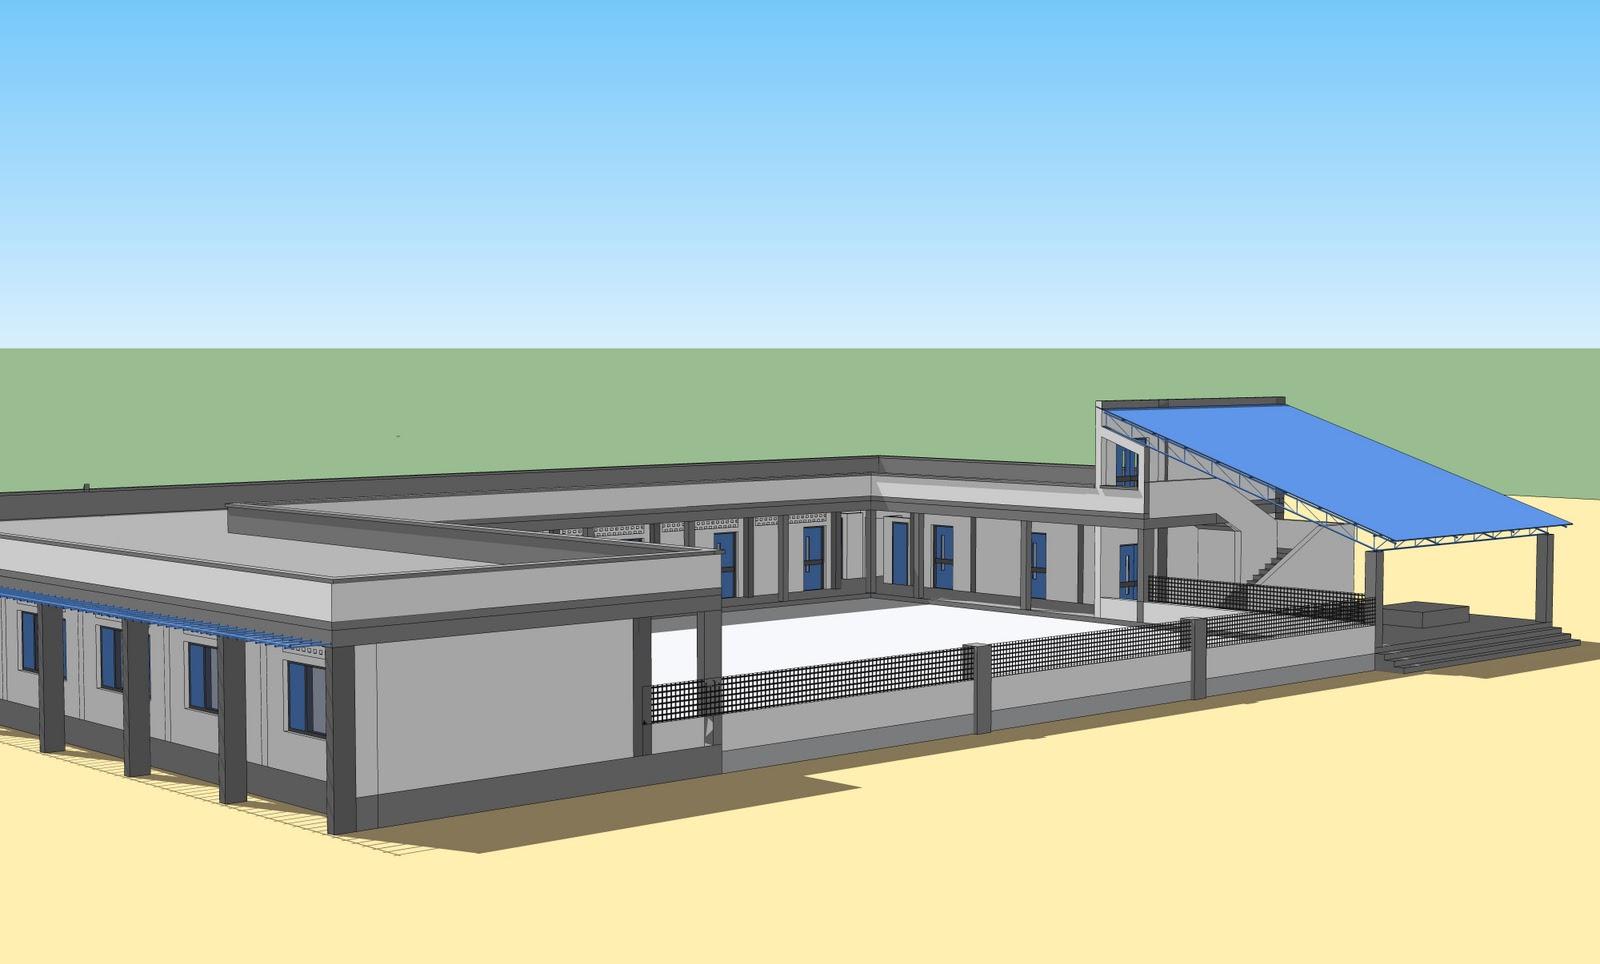 Infor Care Rdf School Building Design